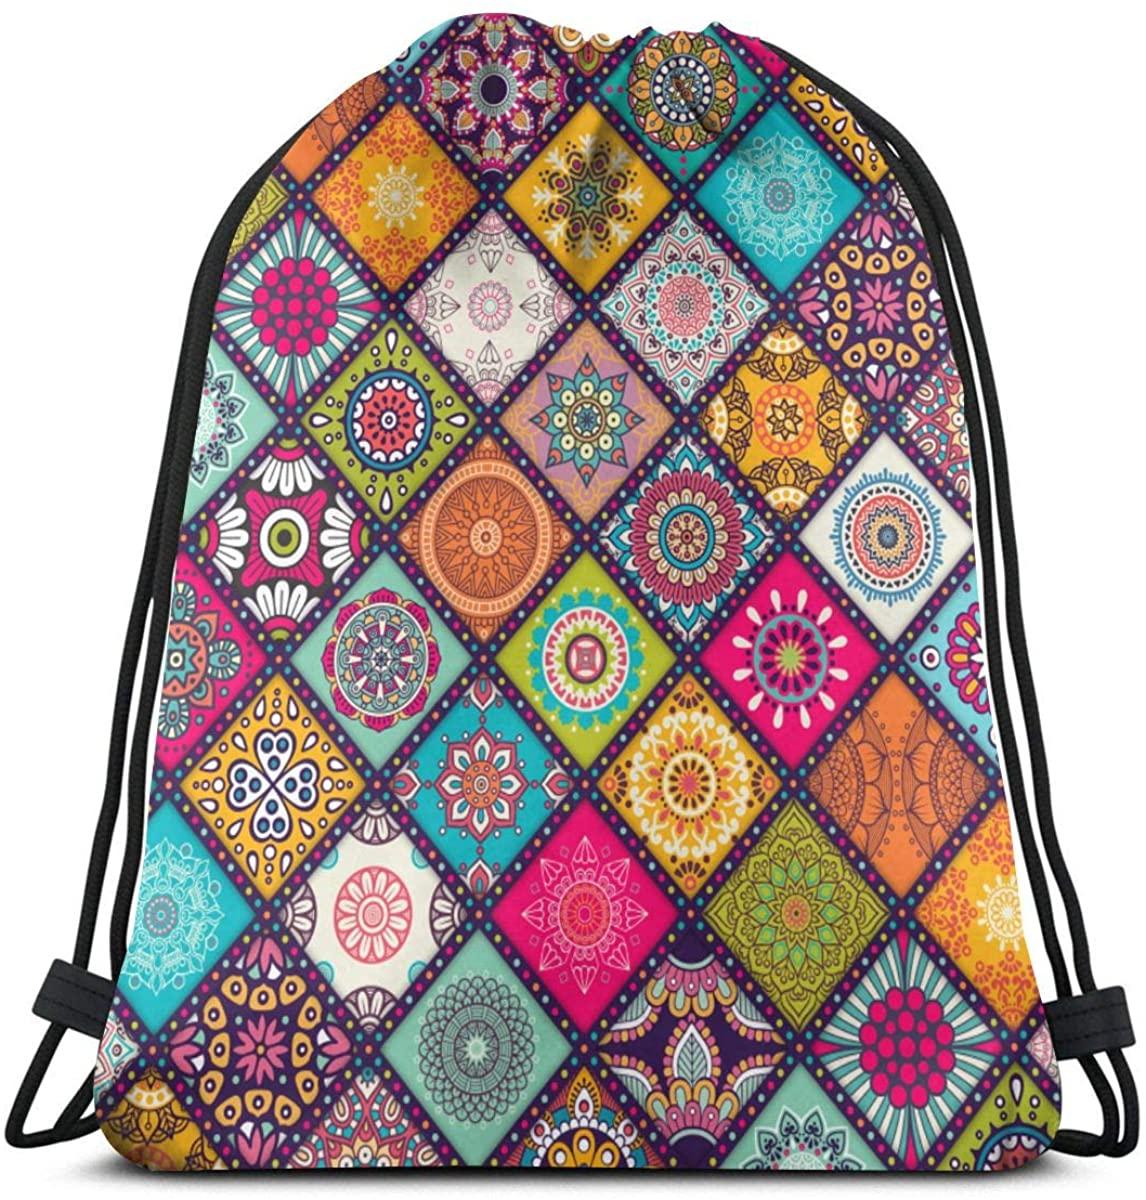 Drawstring Bags Laundry Bag Mandala Storage Pouch Bag Drawstring Backpack Bag Washable Dust-Proof Breathable Non-Transparent Travel Sport Gym Sackpack For Men Women